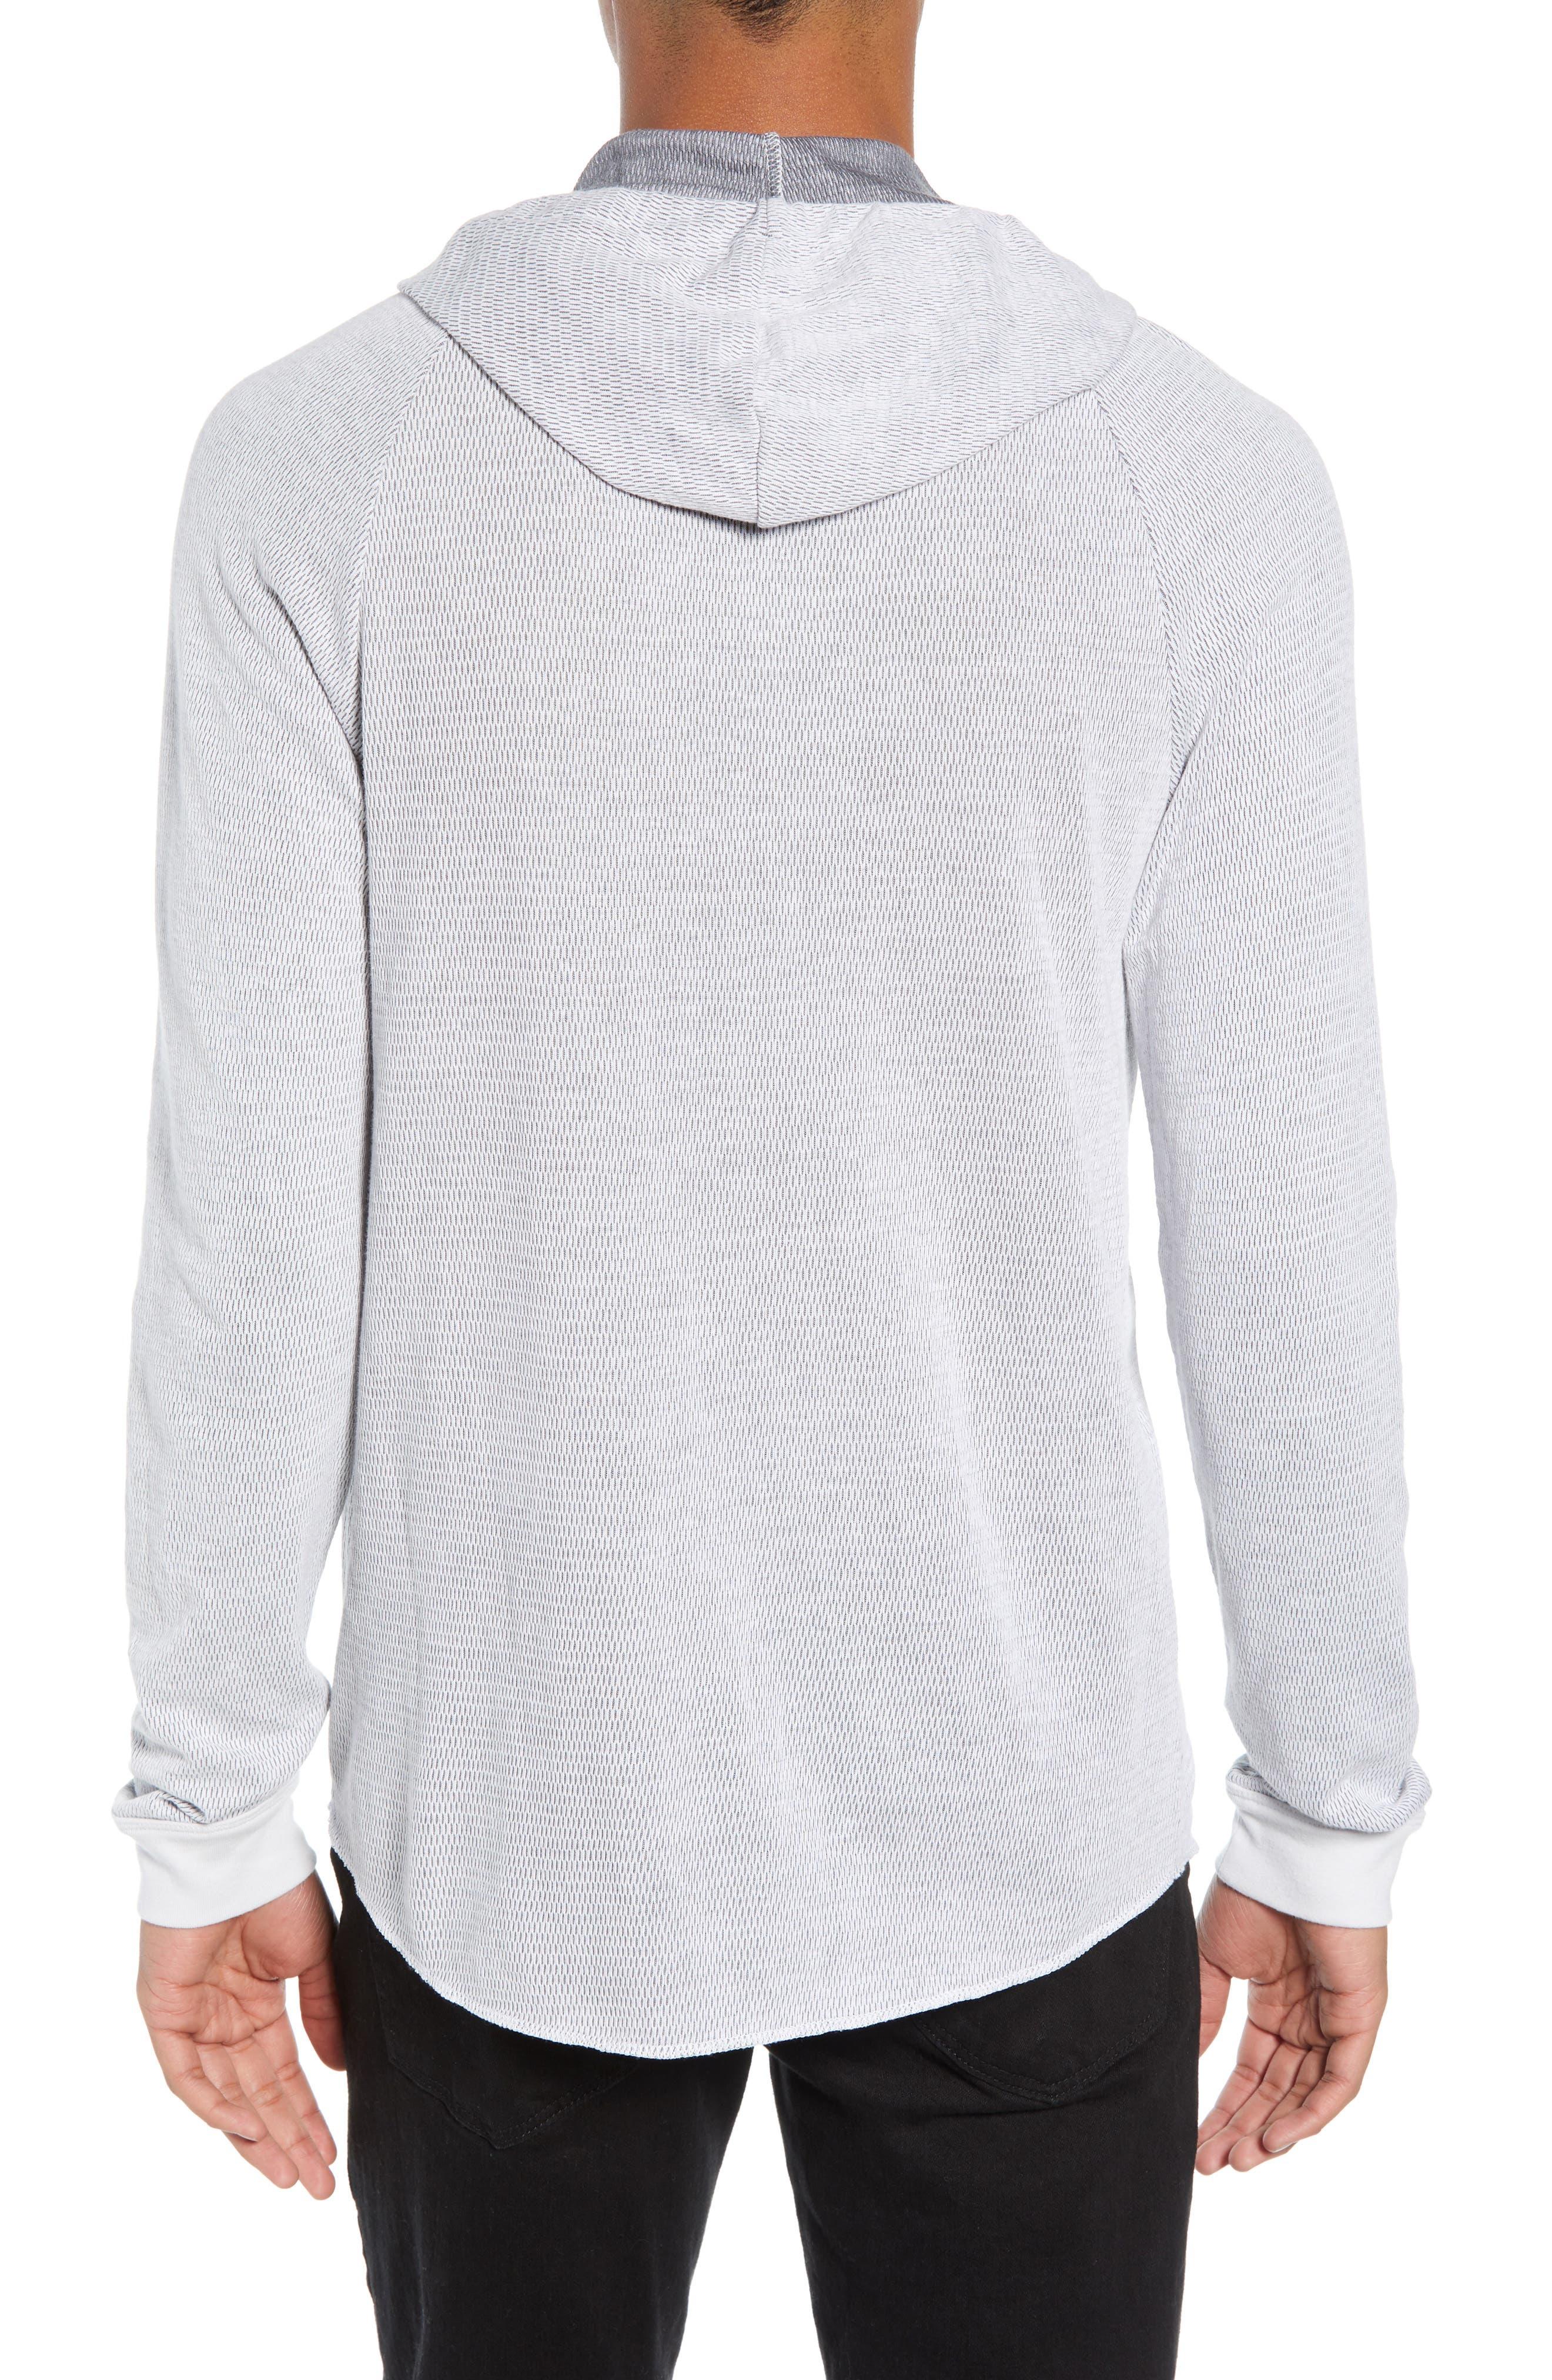 Thermal Knit Raglan Hoodie,                             Alternate thumbnail 2, color,                             GREY/ WHITE TWO TONE